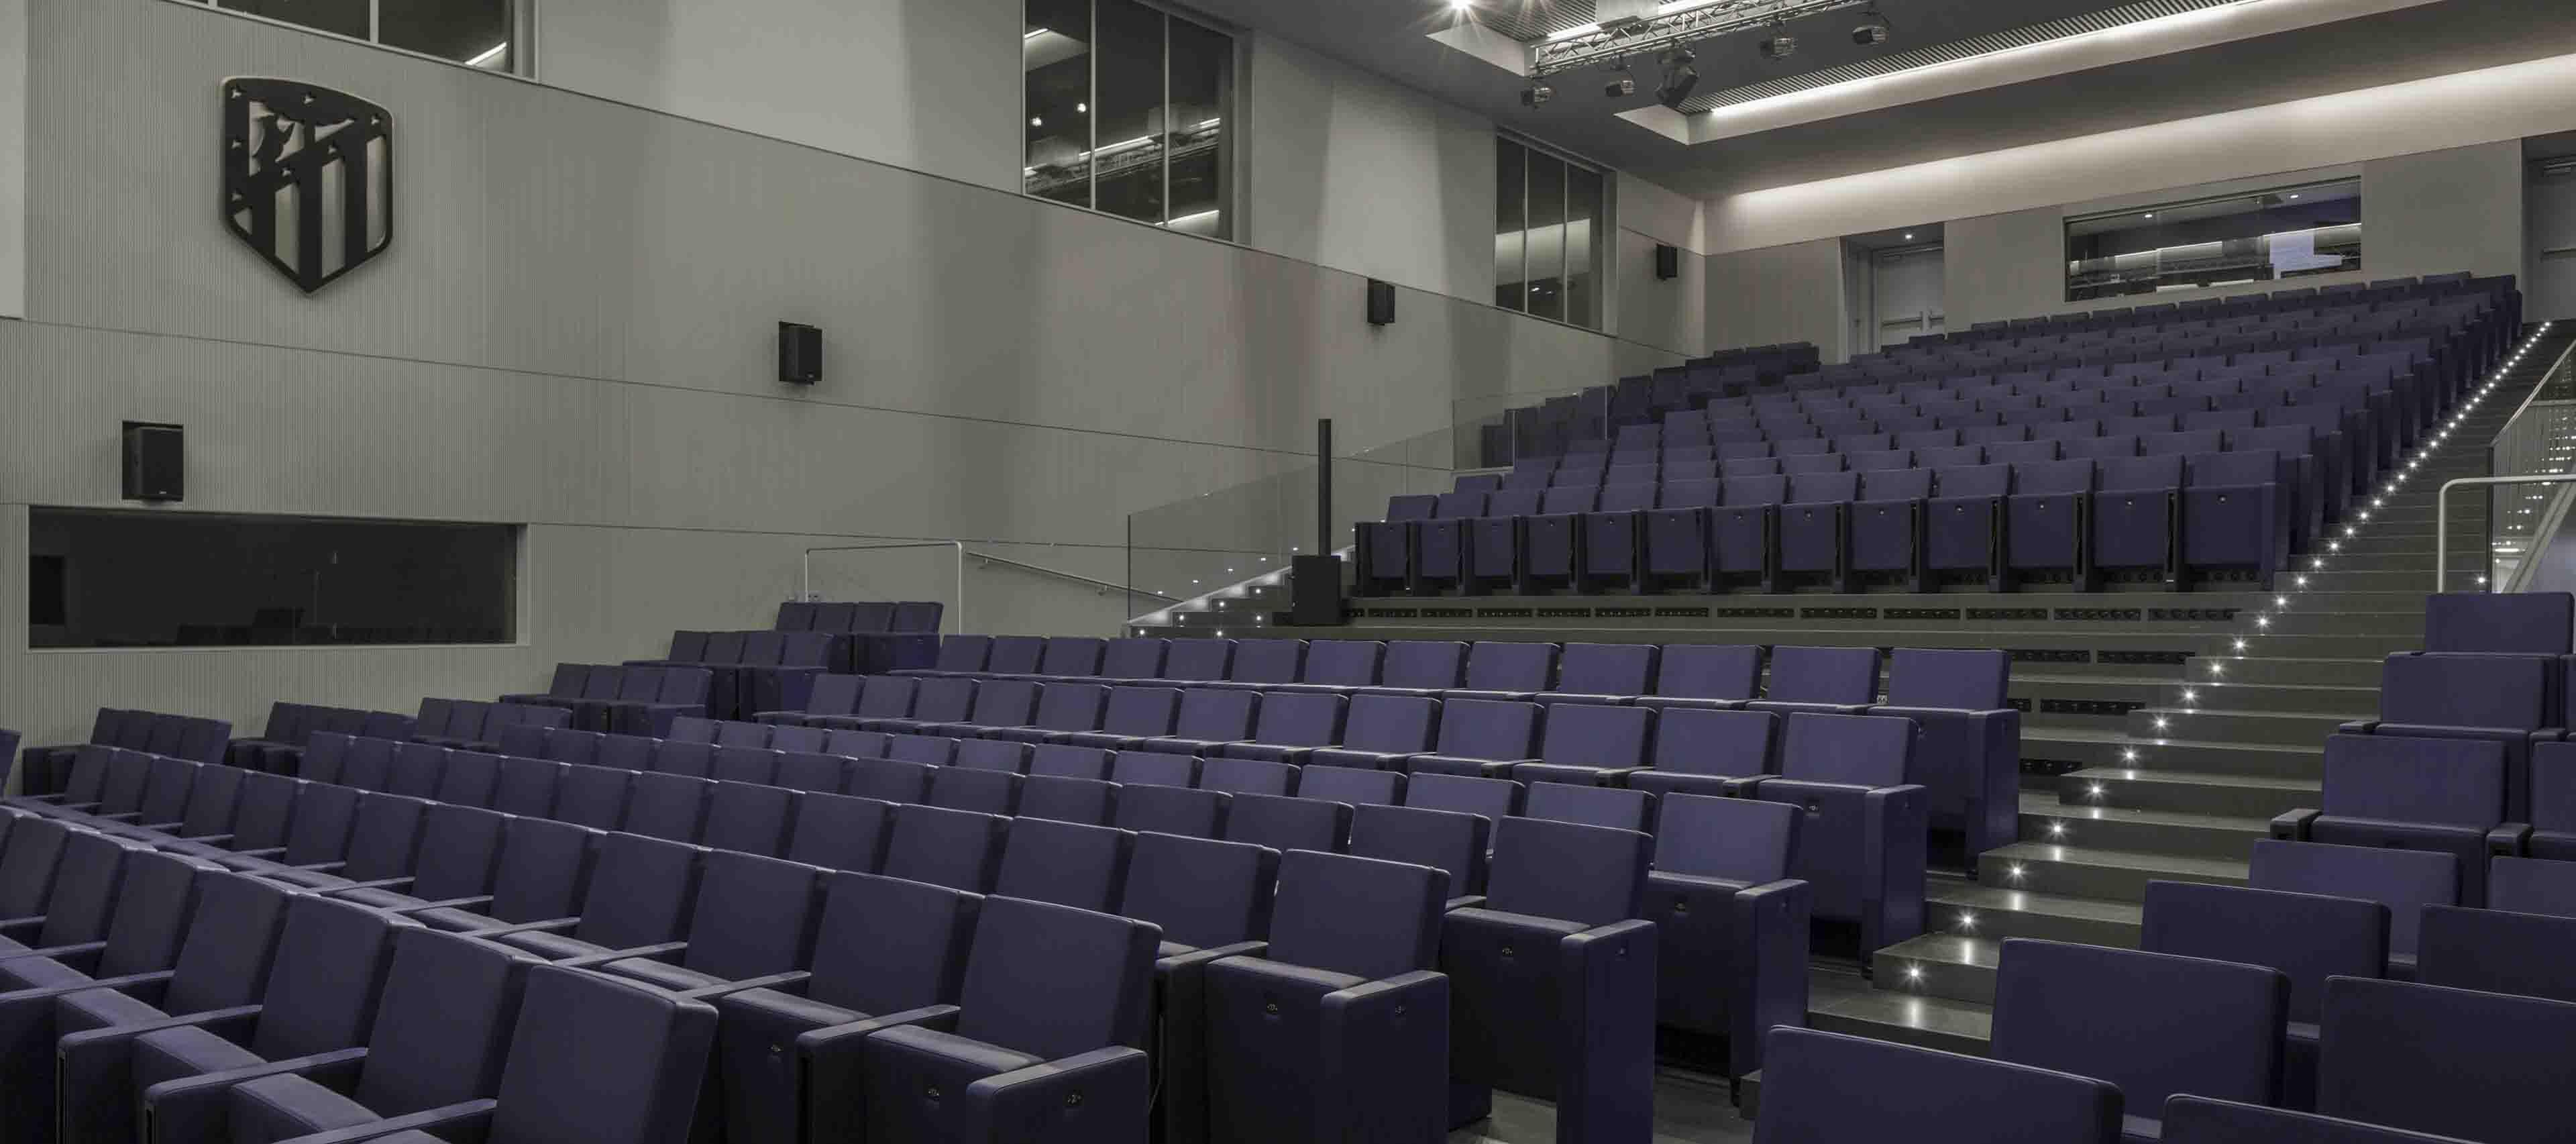 LAMM F50 Auditorium Chair   Woodwood Group